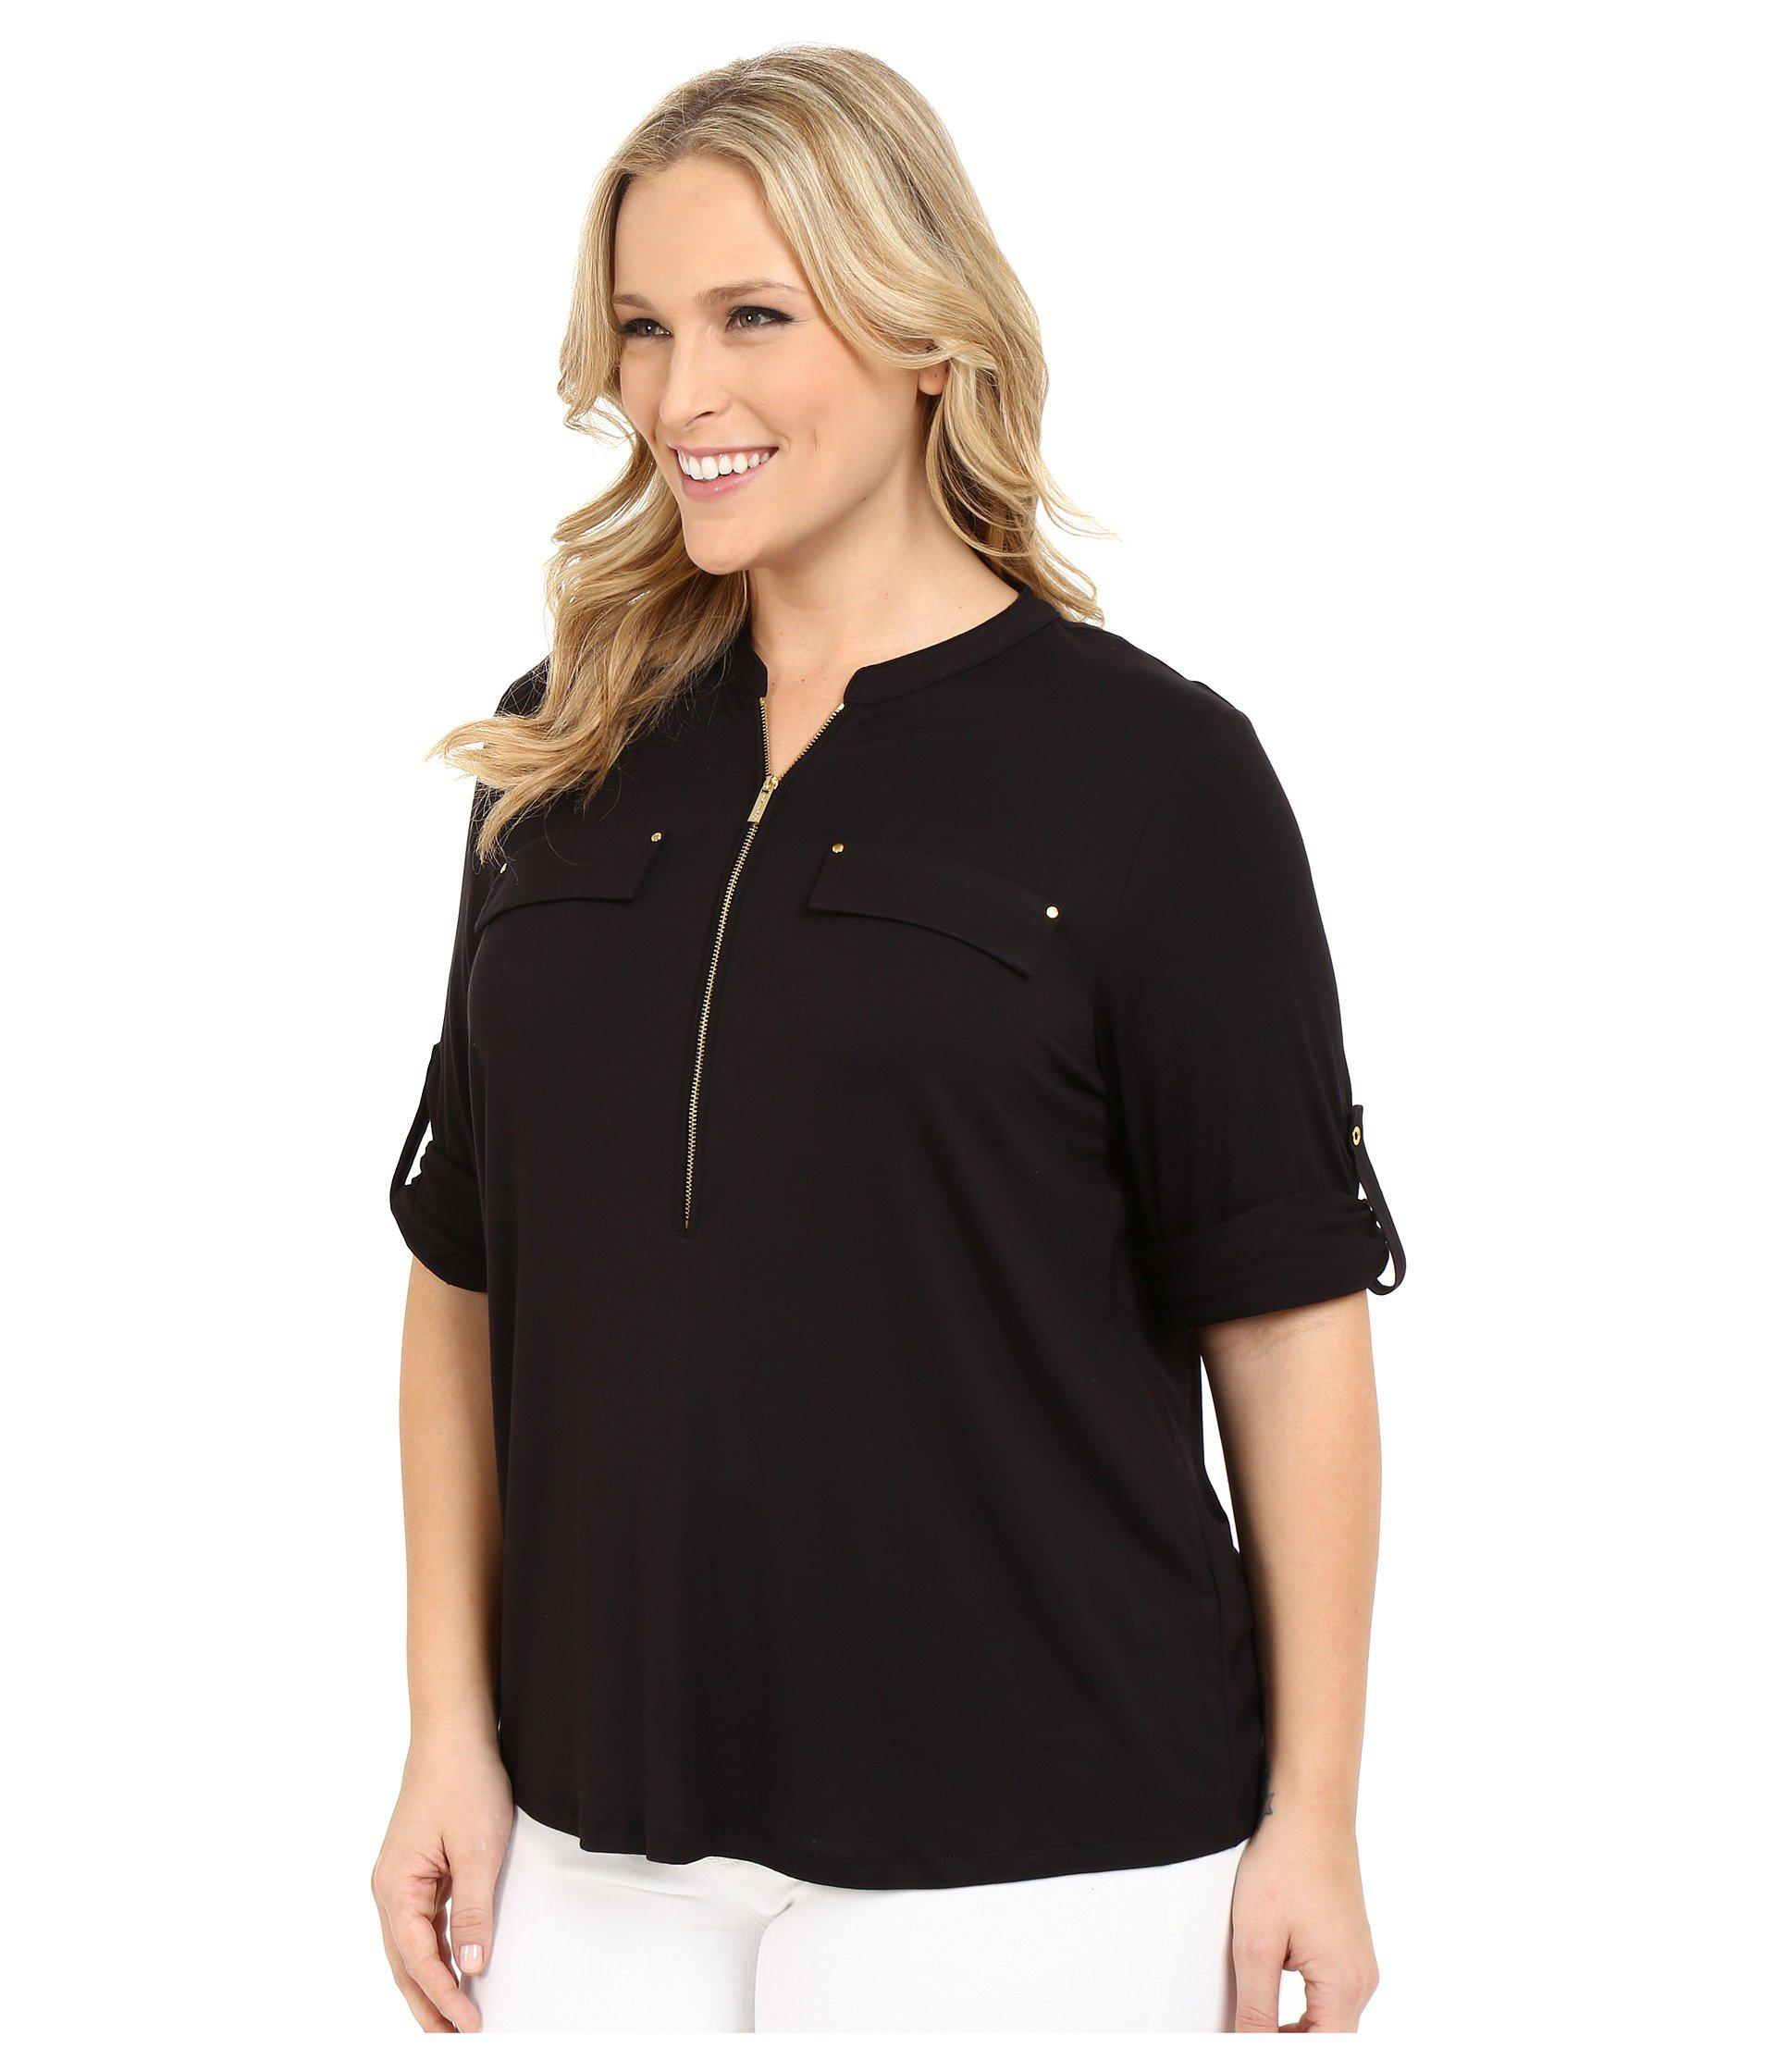 276991c1fbbfc Lyst - Calvin Klein Plus Size Zip Front Roll Sleeve (black) Women s Blouse  in Black